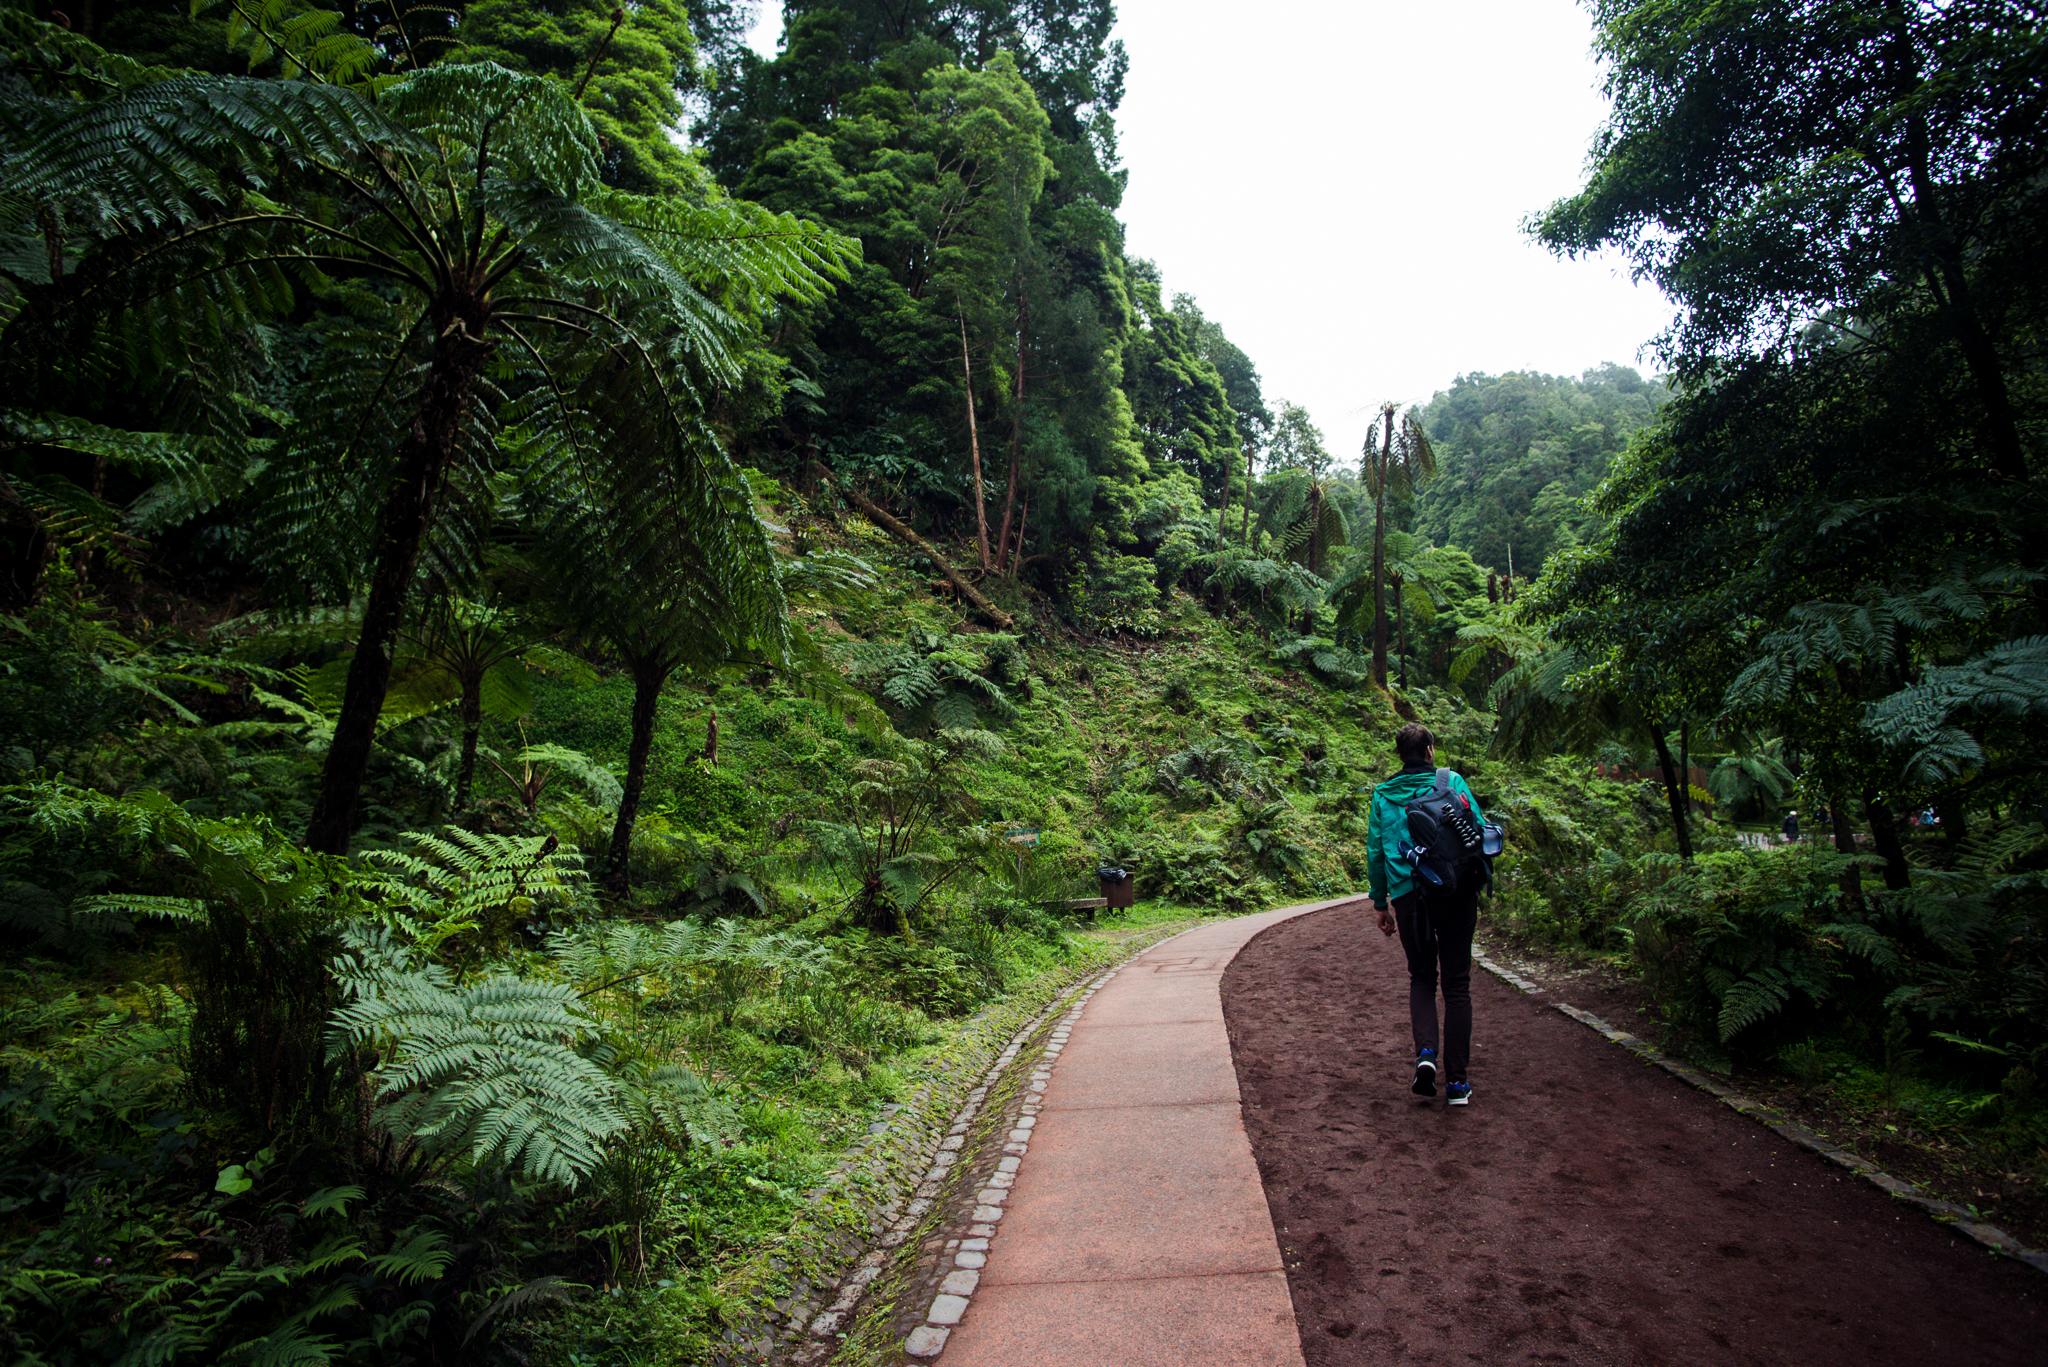 Caldeira Velha park